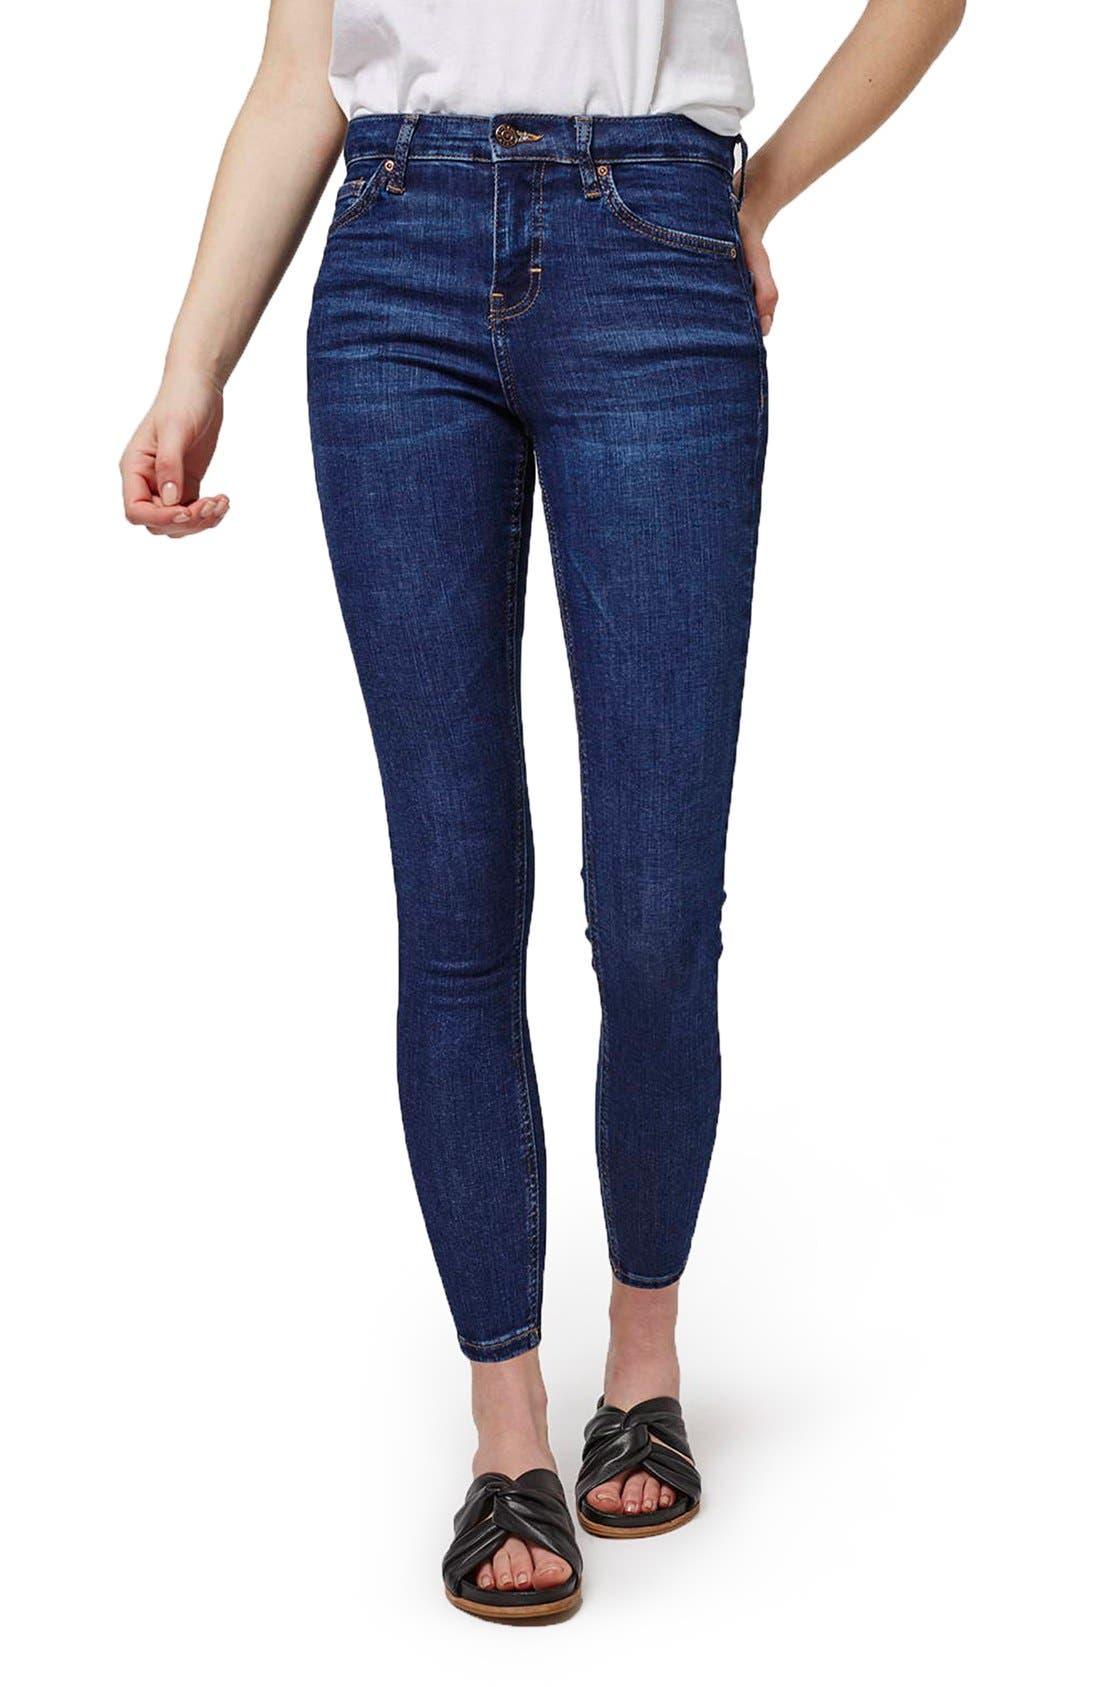 Alternate Image 1 Selected - Topshop 'Jamie' High Rise Ankle Skinny Jeans (Petite)